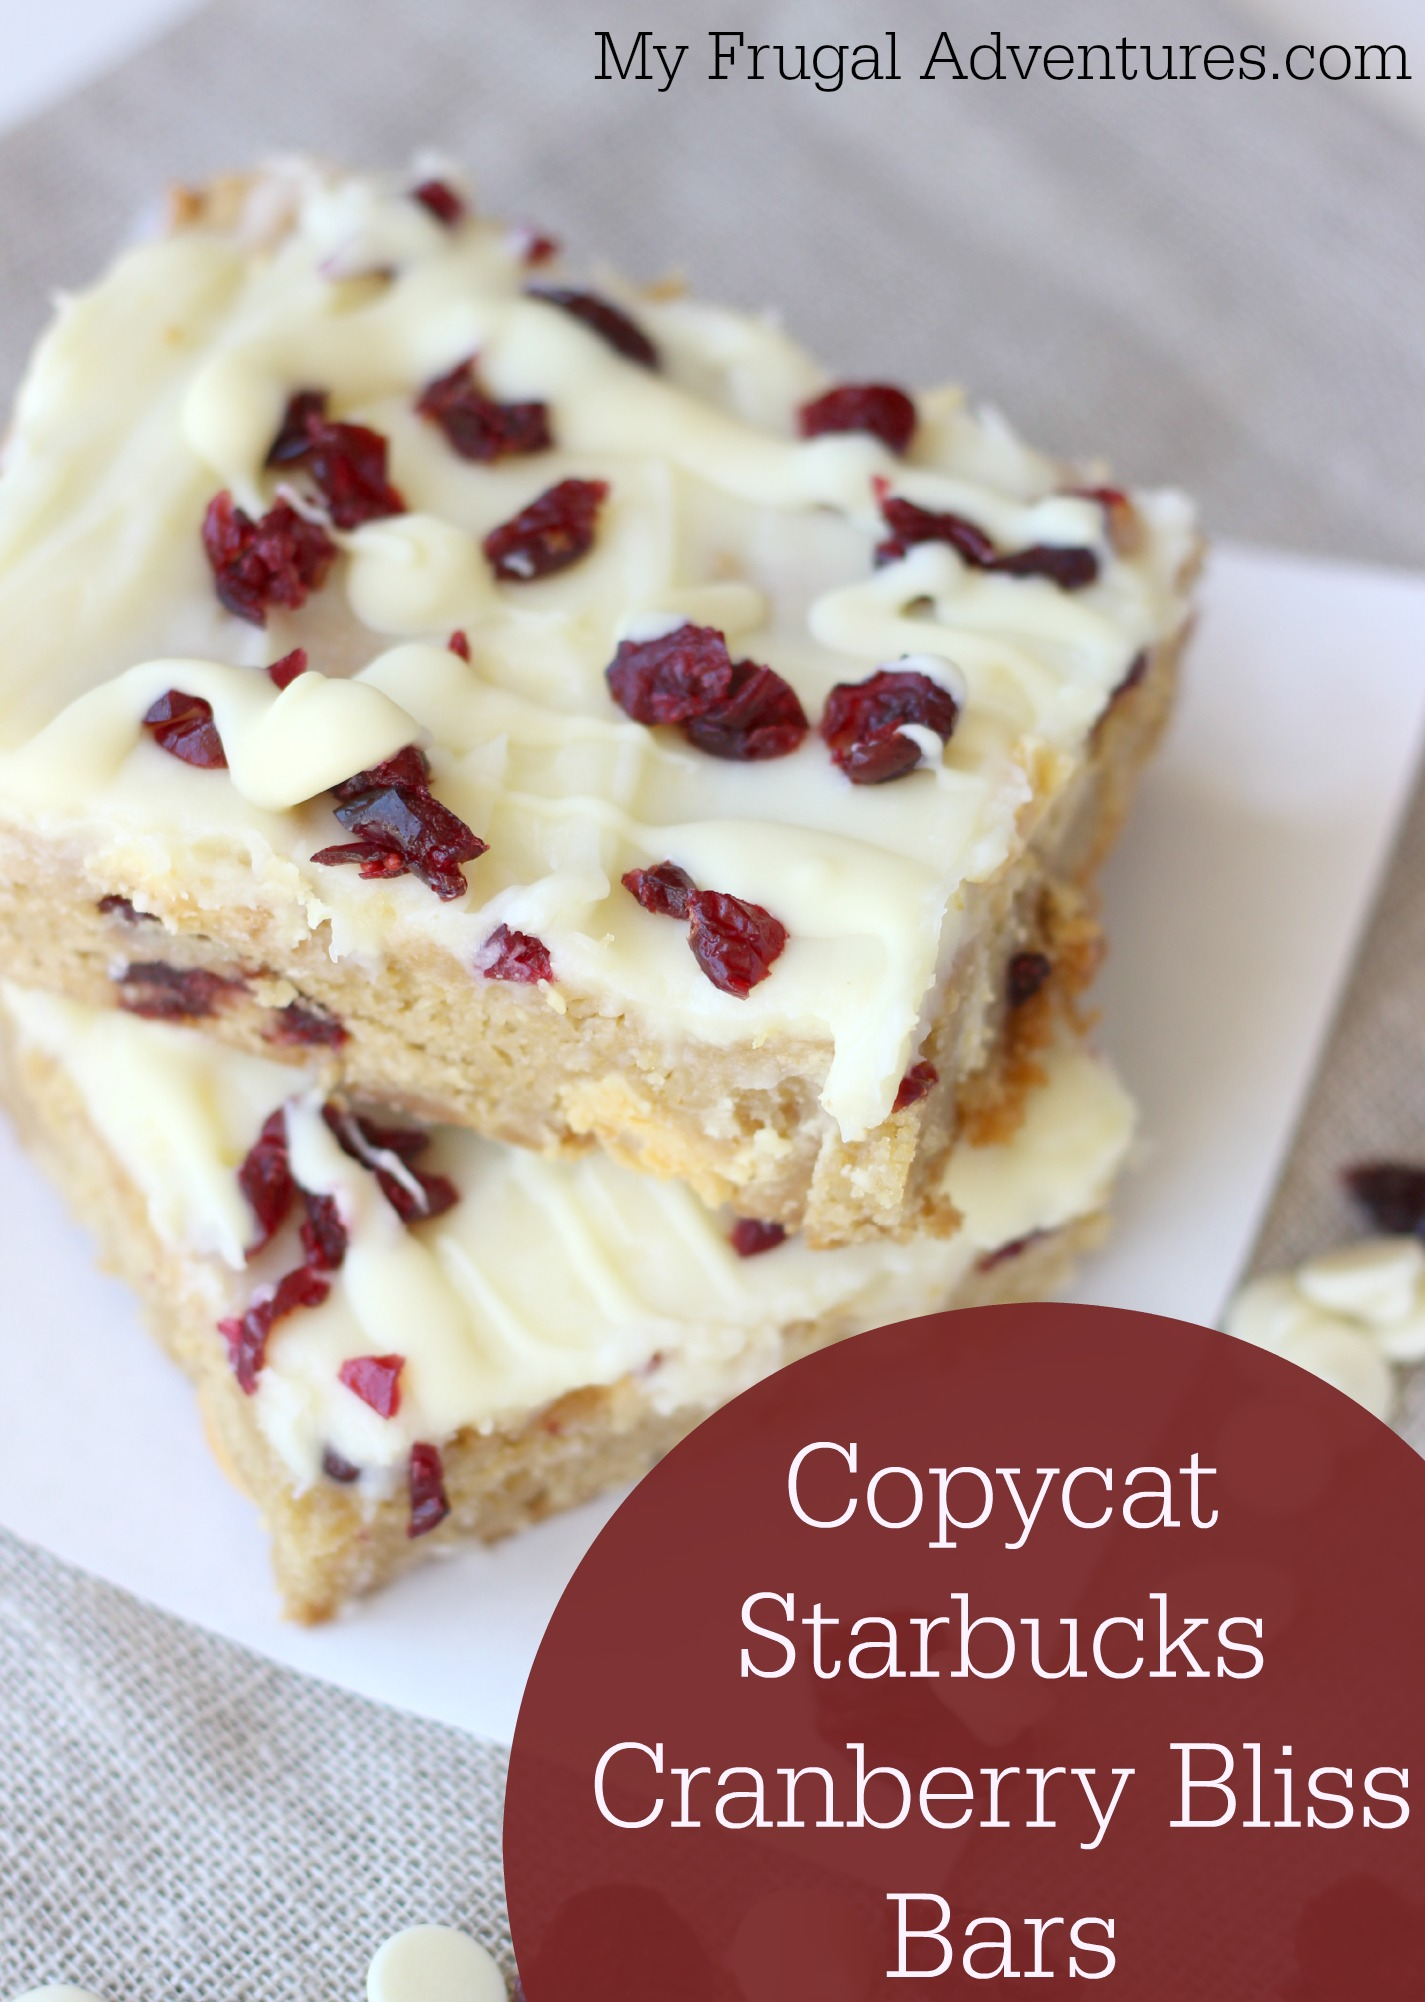 Copycat Starbucks Cranberry Bliss Bars Recipe - My Frugal Adventures